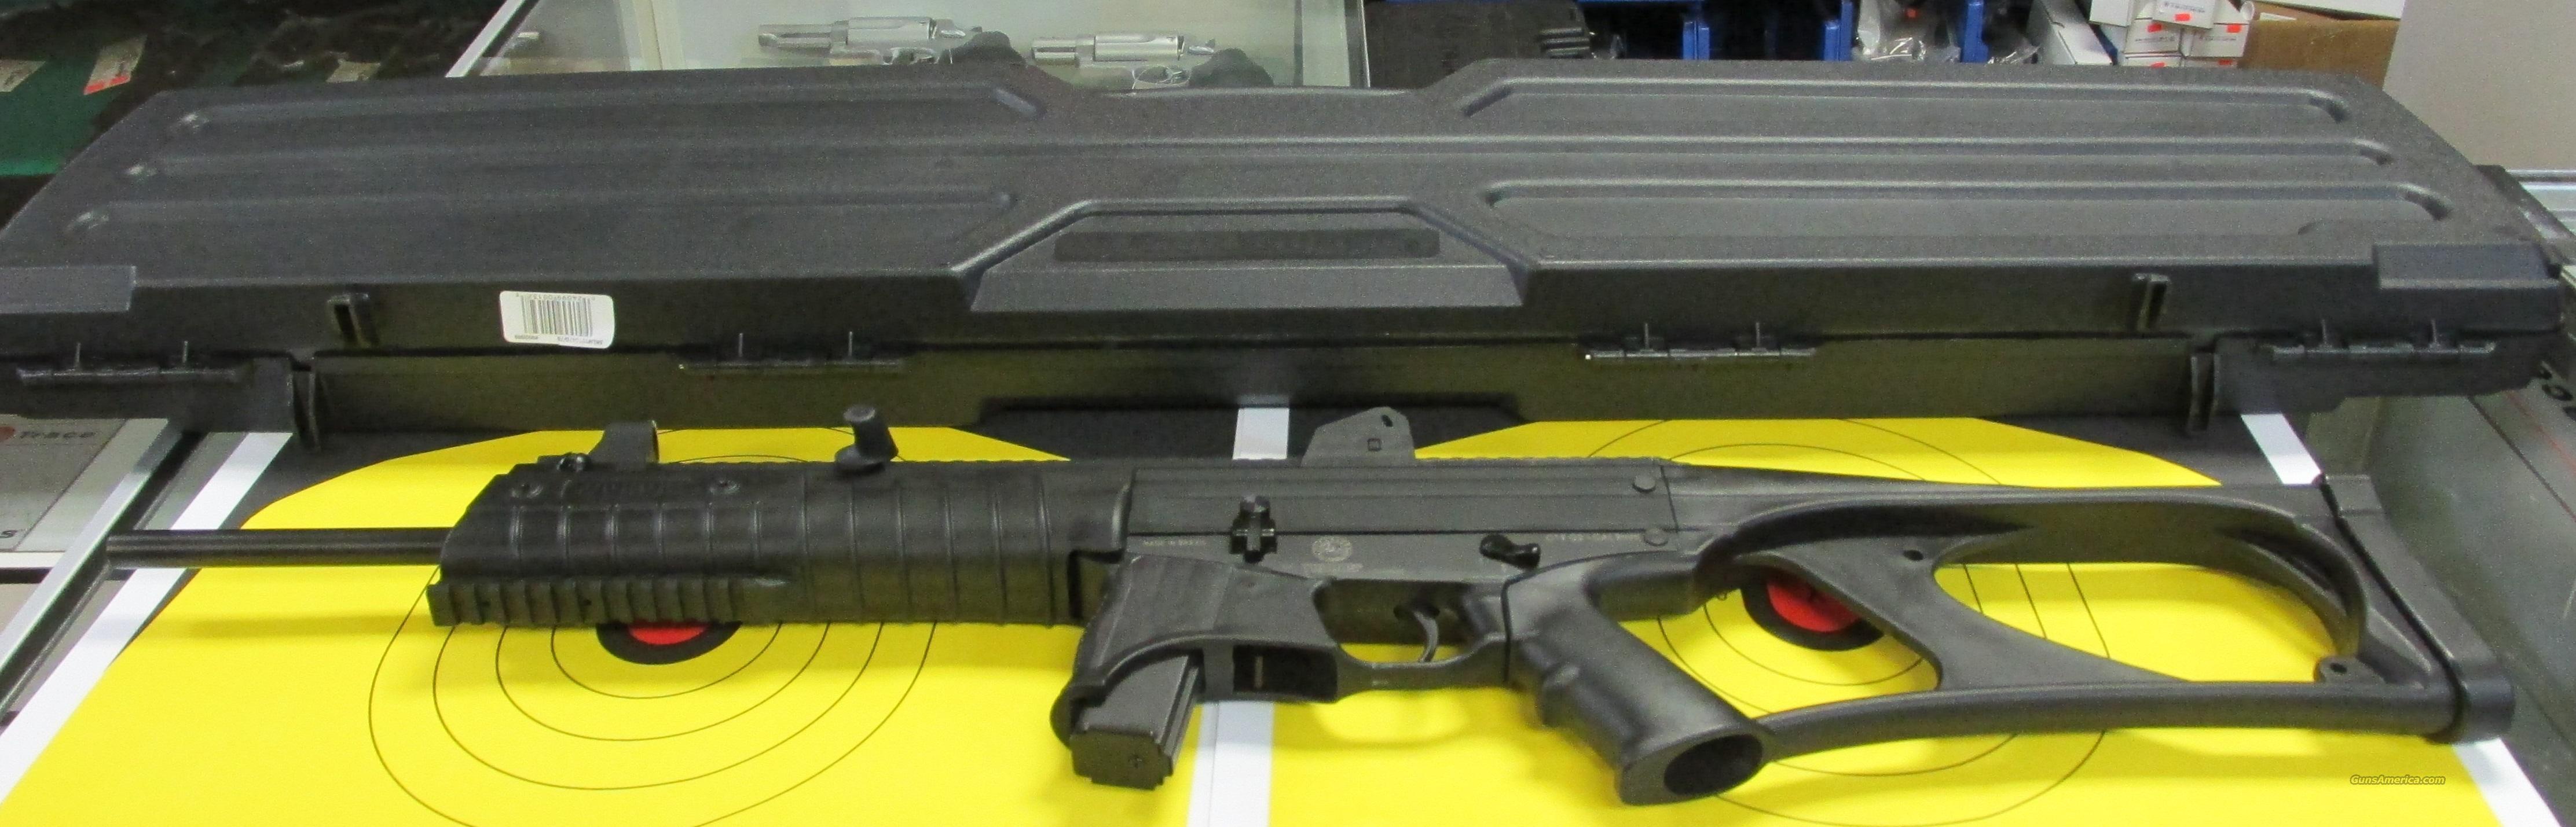 "TaurusCT962 Carbine 9mm 16""   Guns > Rifles > Taurus Rifles"